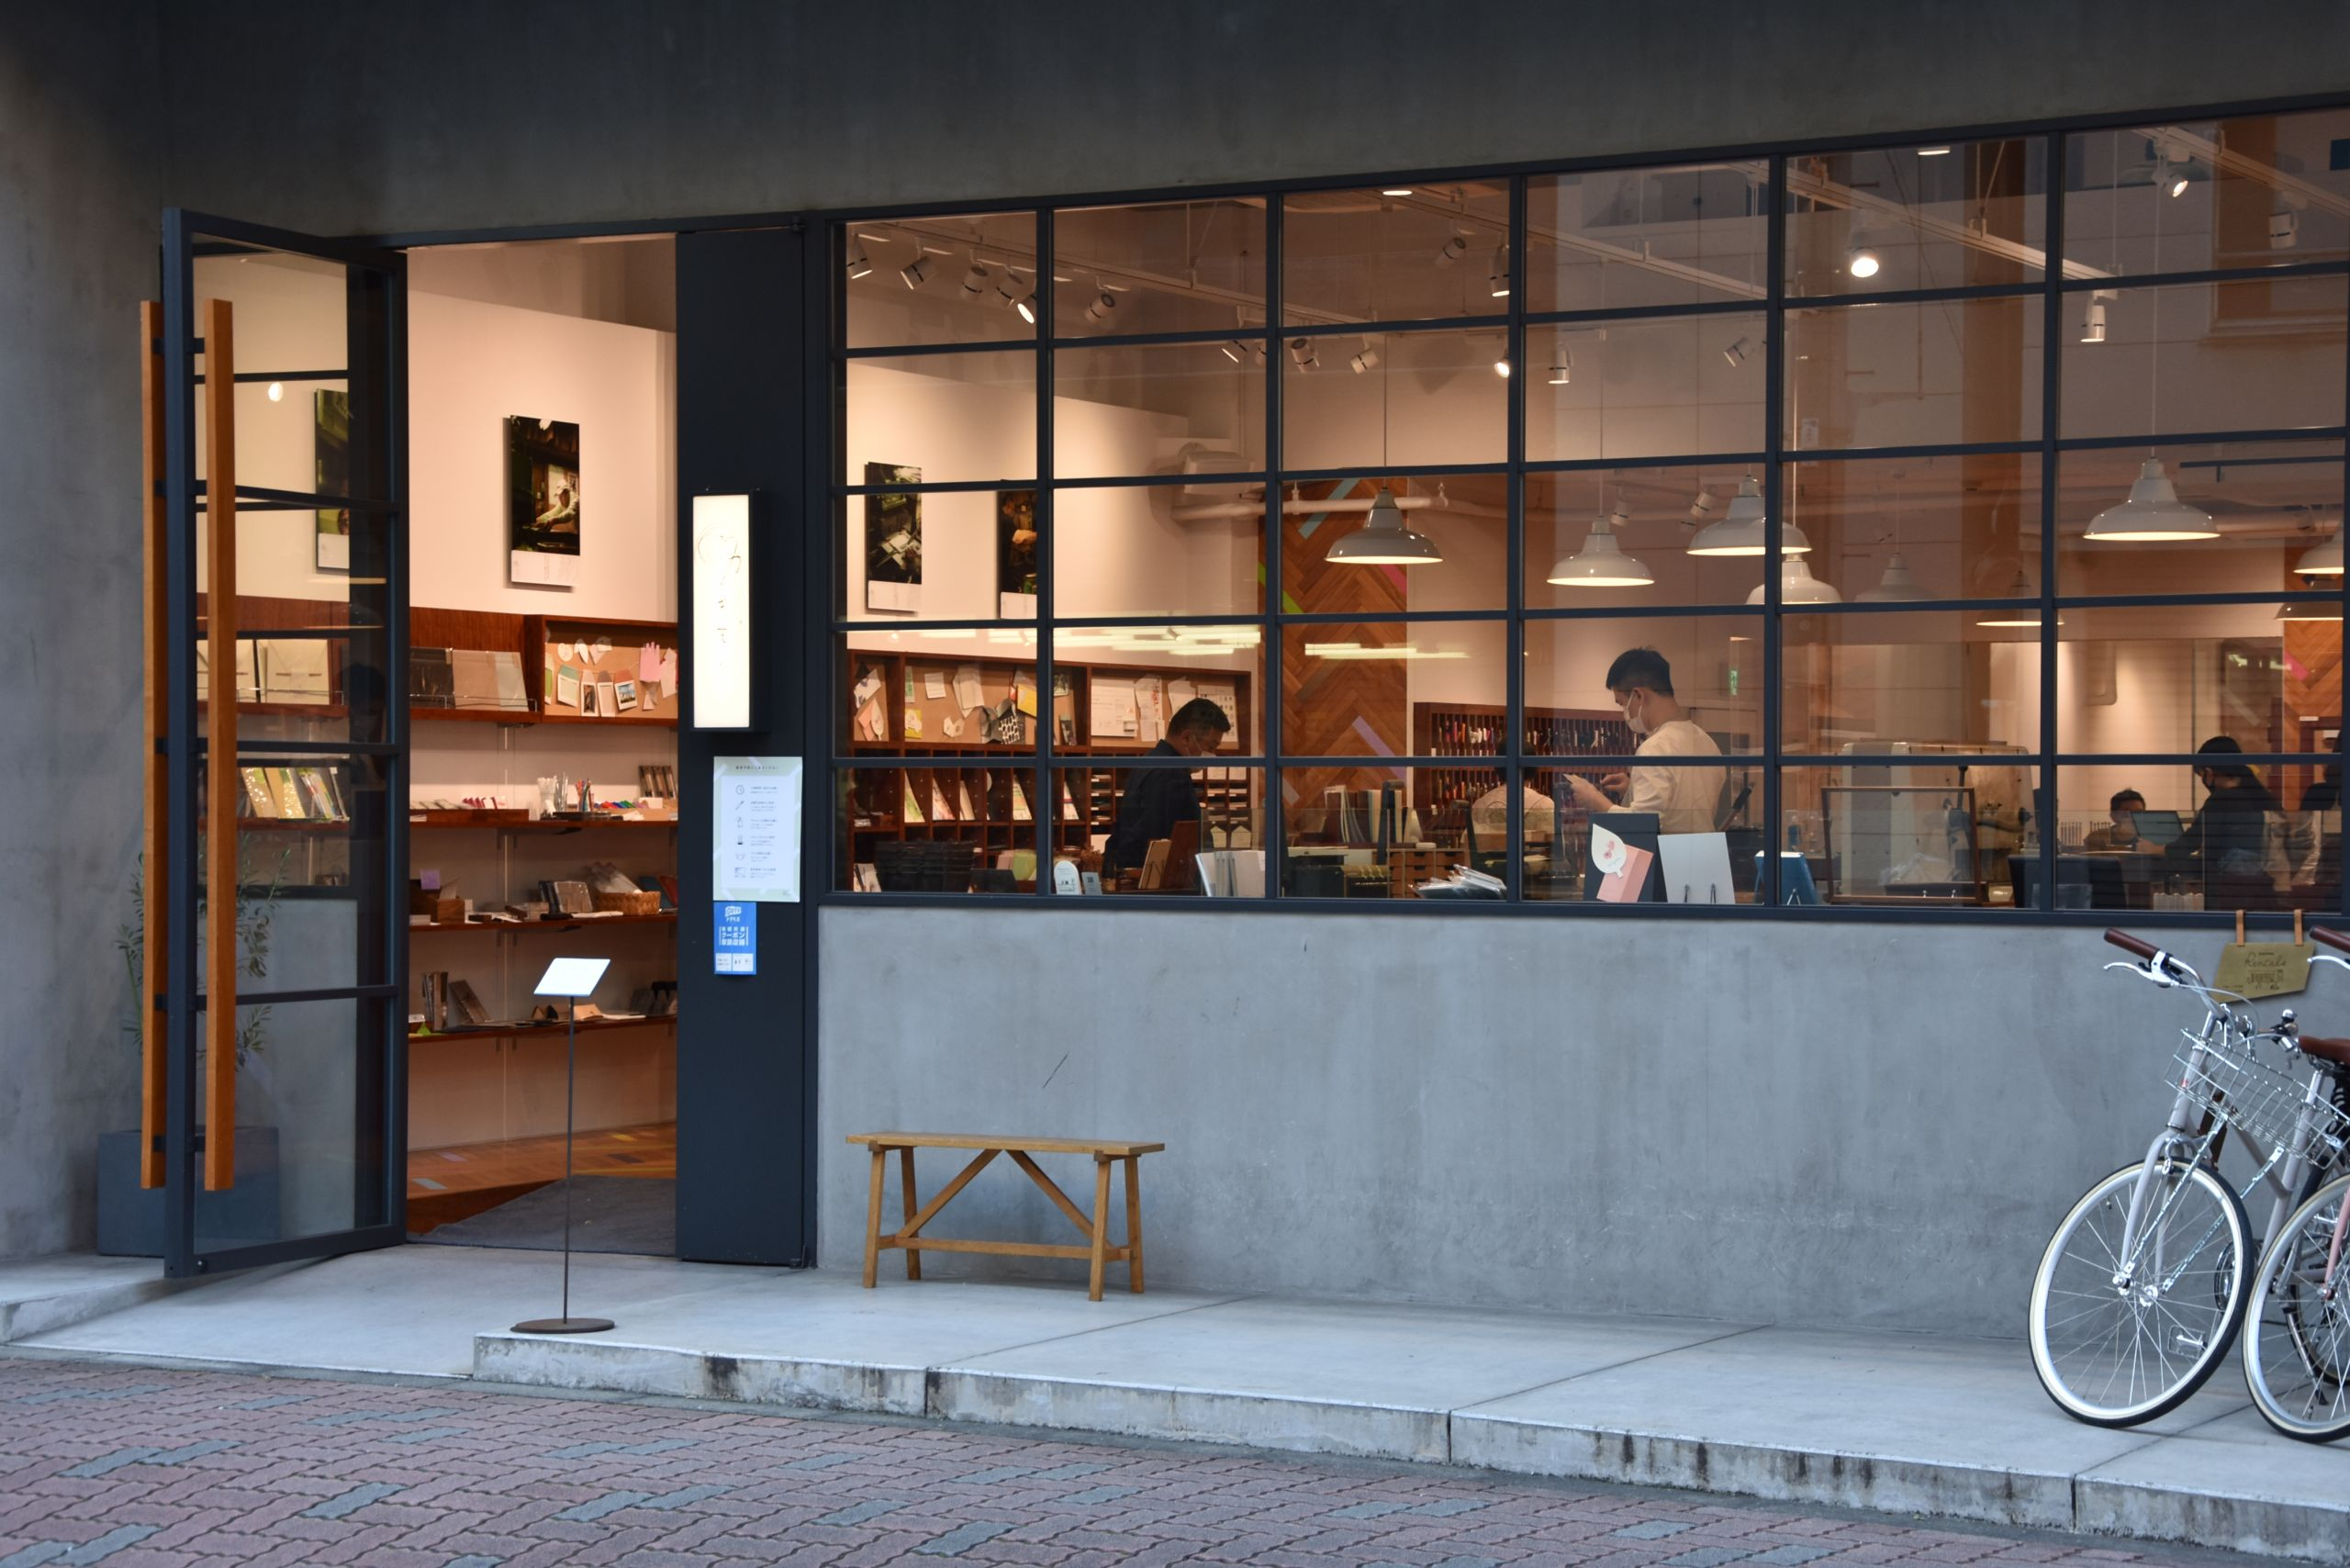 kakimori stationary shop kuramae metropolis almost perfect